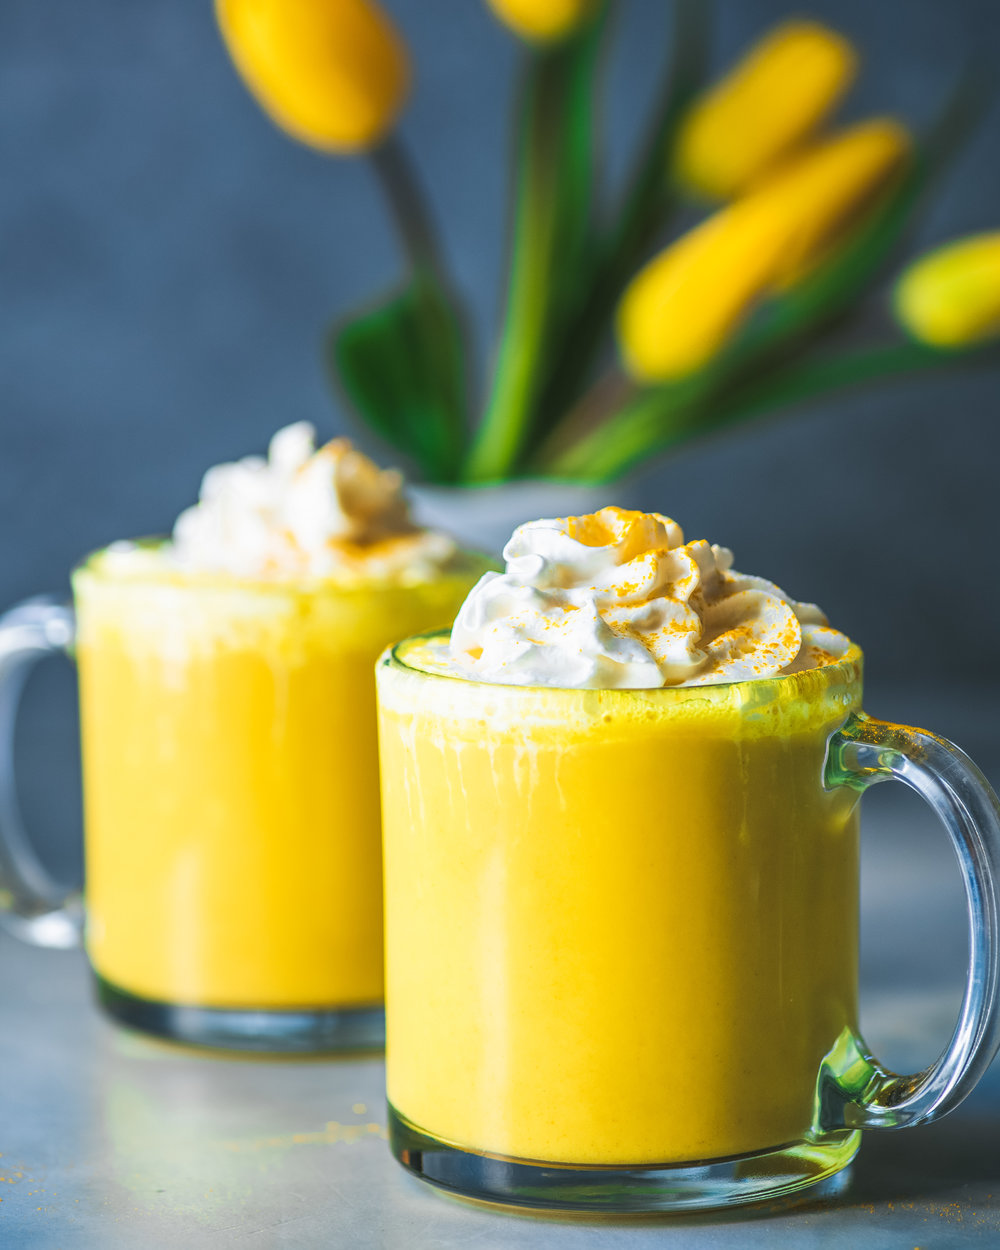 Vegan Golden Milk Turmeric Latte